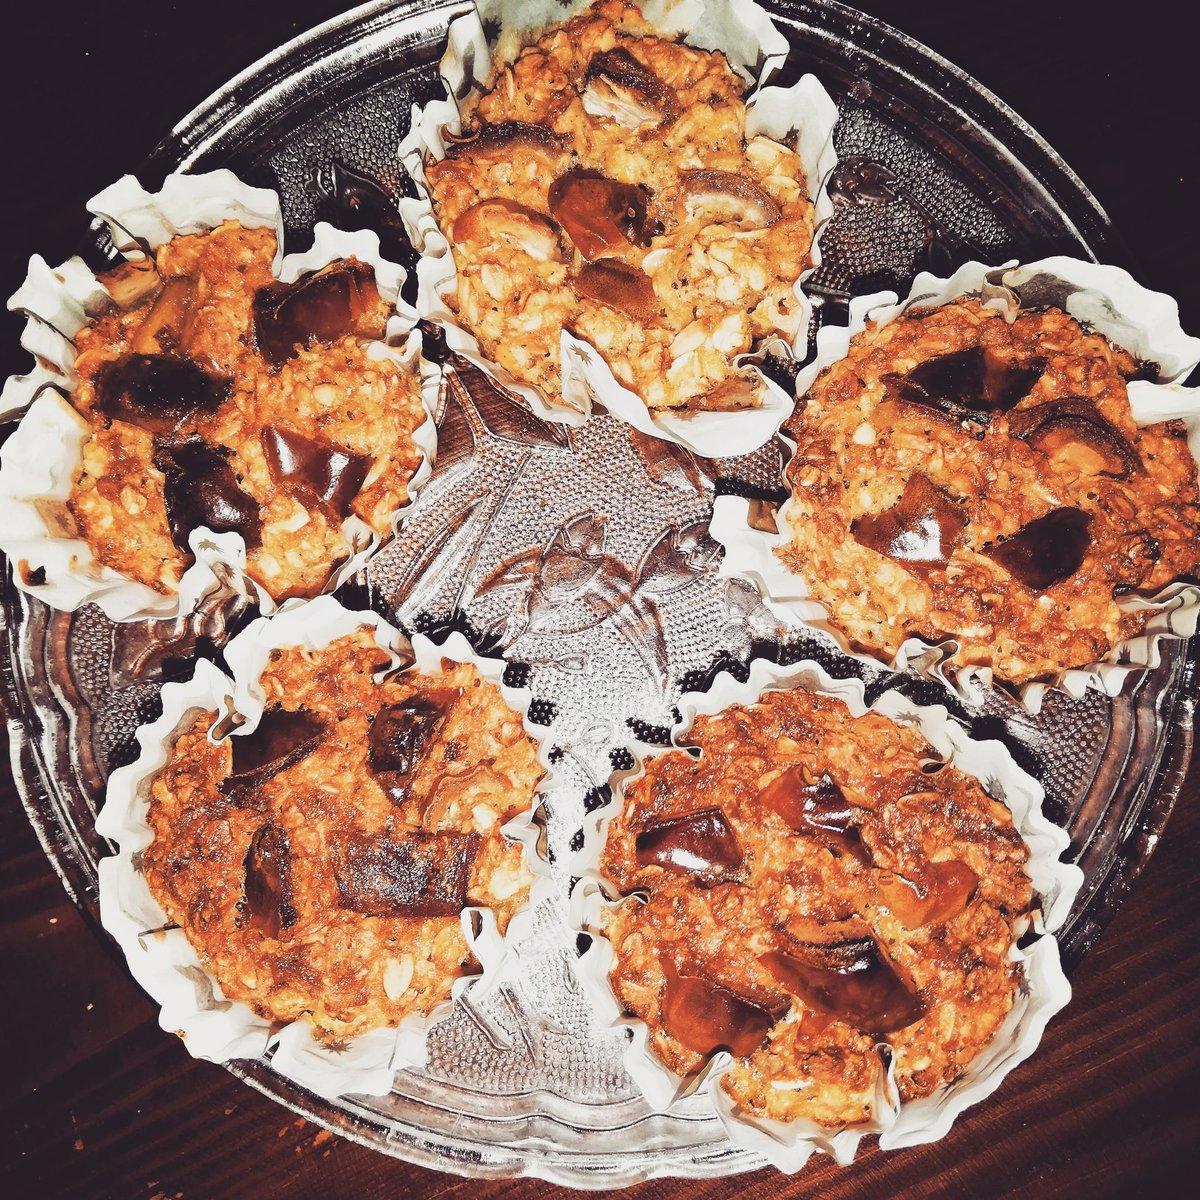 #f4f #cupcakes #amazing #lfl #muffins #cake #fff #instadaily @rocket_hastags #fresh #likeforlike #instalike #l4l #followforfollow #brown #instalikesandfollowers4u #instagood #sweet #cooking #like4like #sweet #cream #Chocolate  #instafood #follow4follow #love